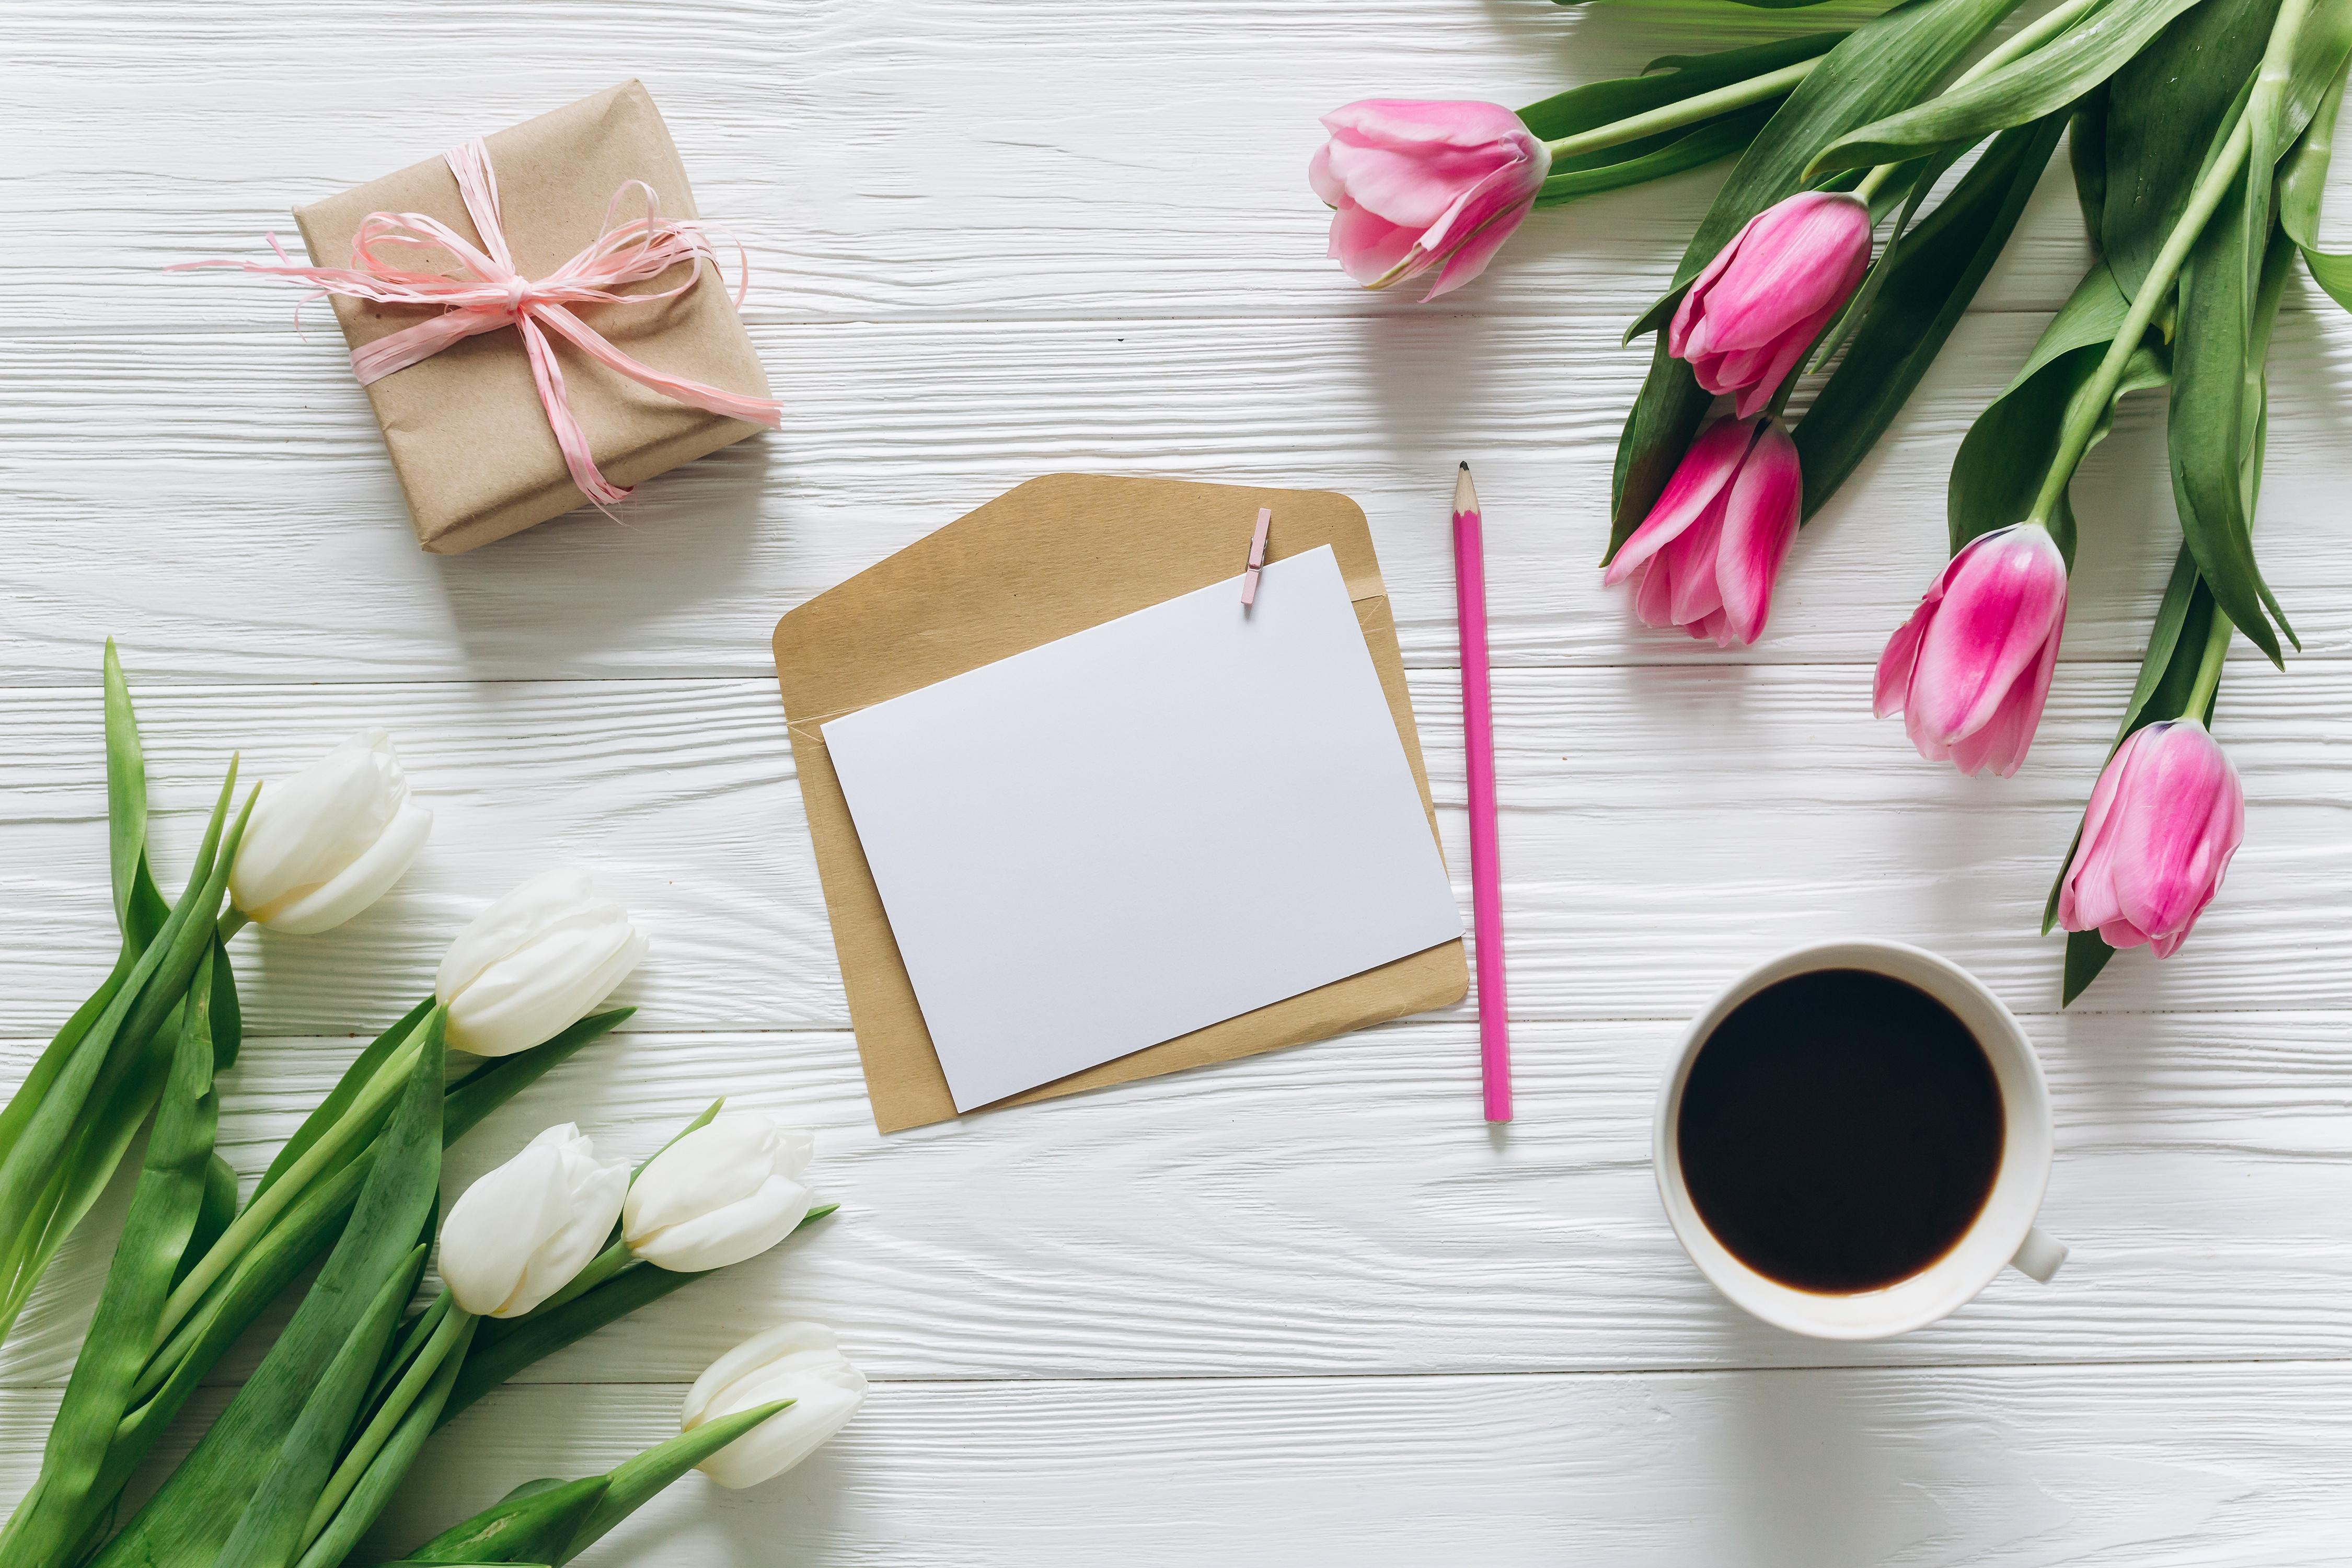 Тюльпаны и книги картинки